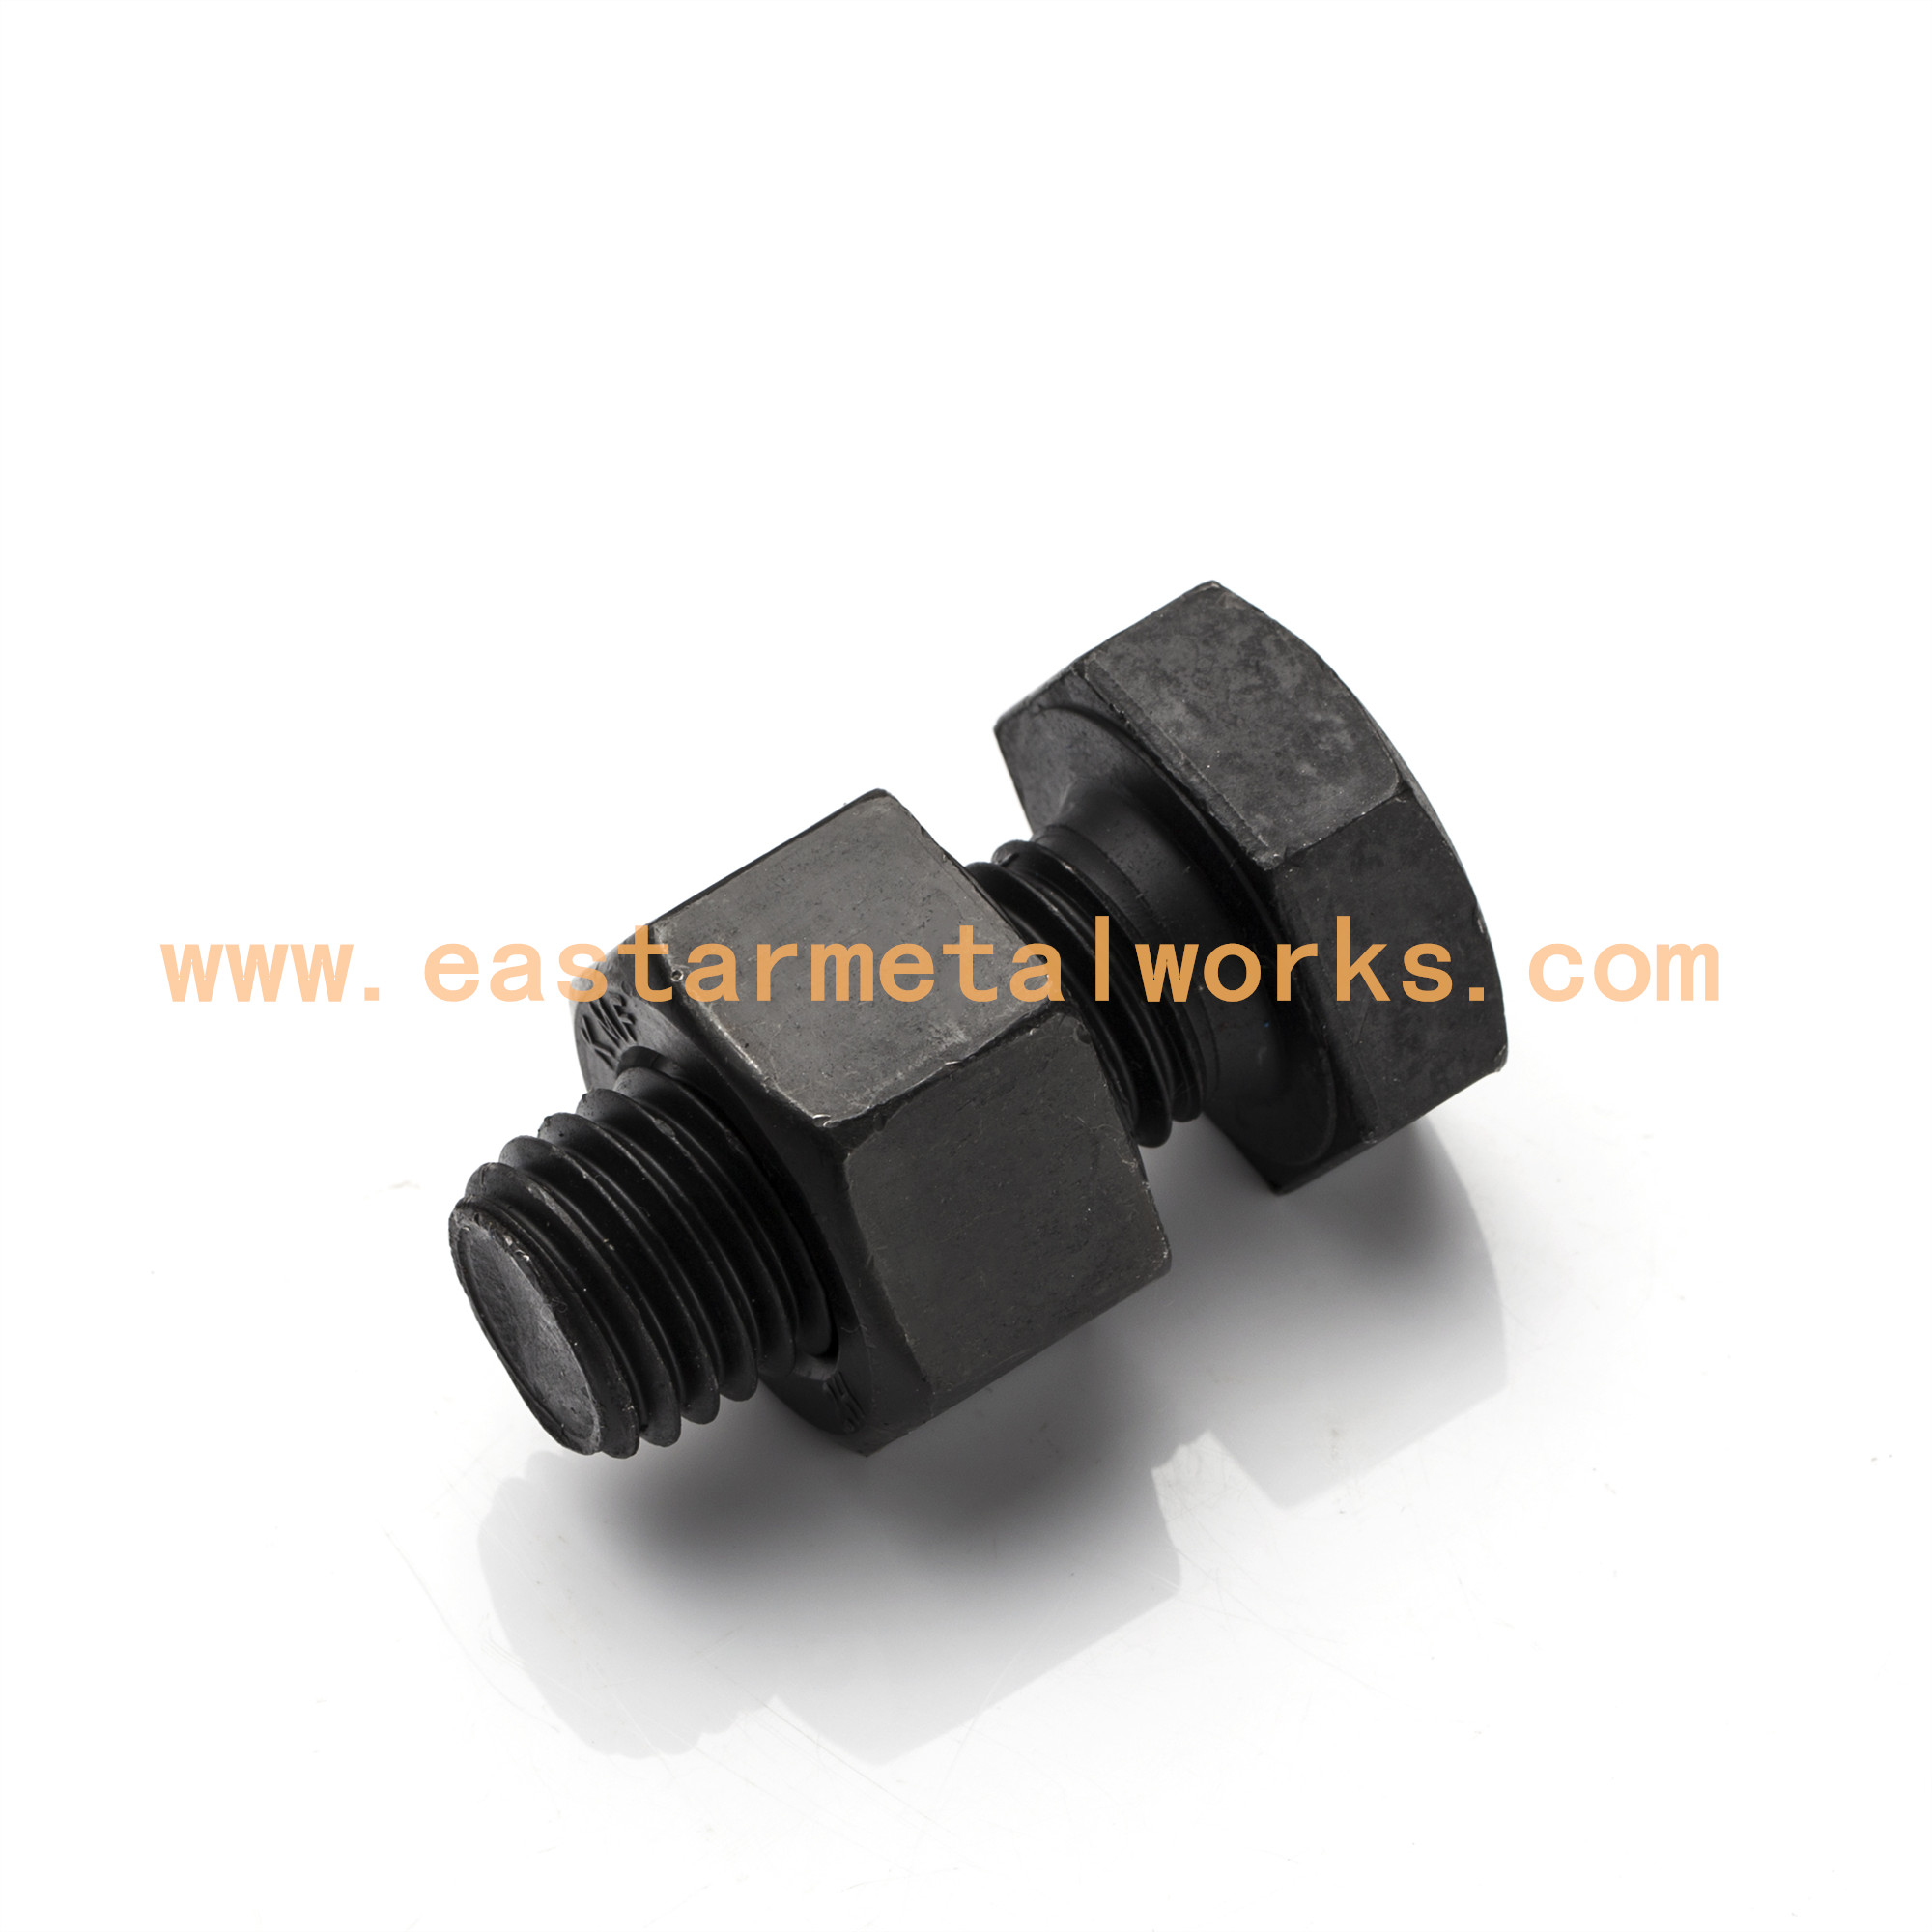 ASTM A325 Hex bolts